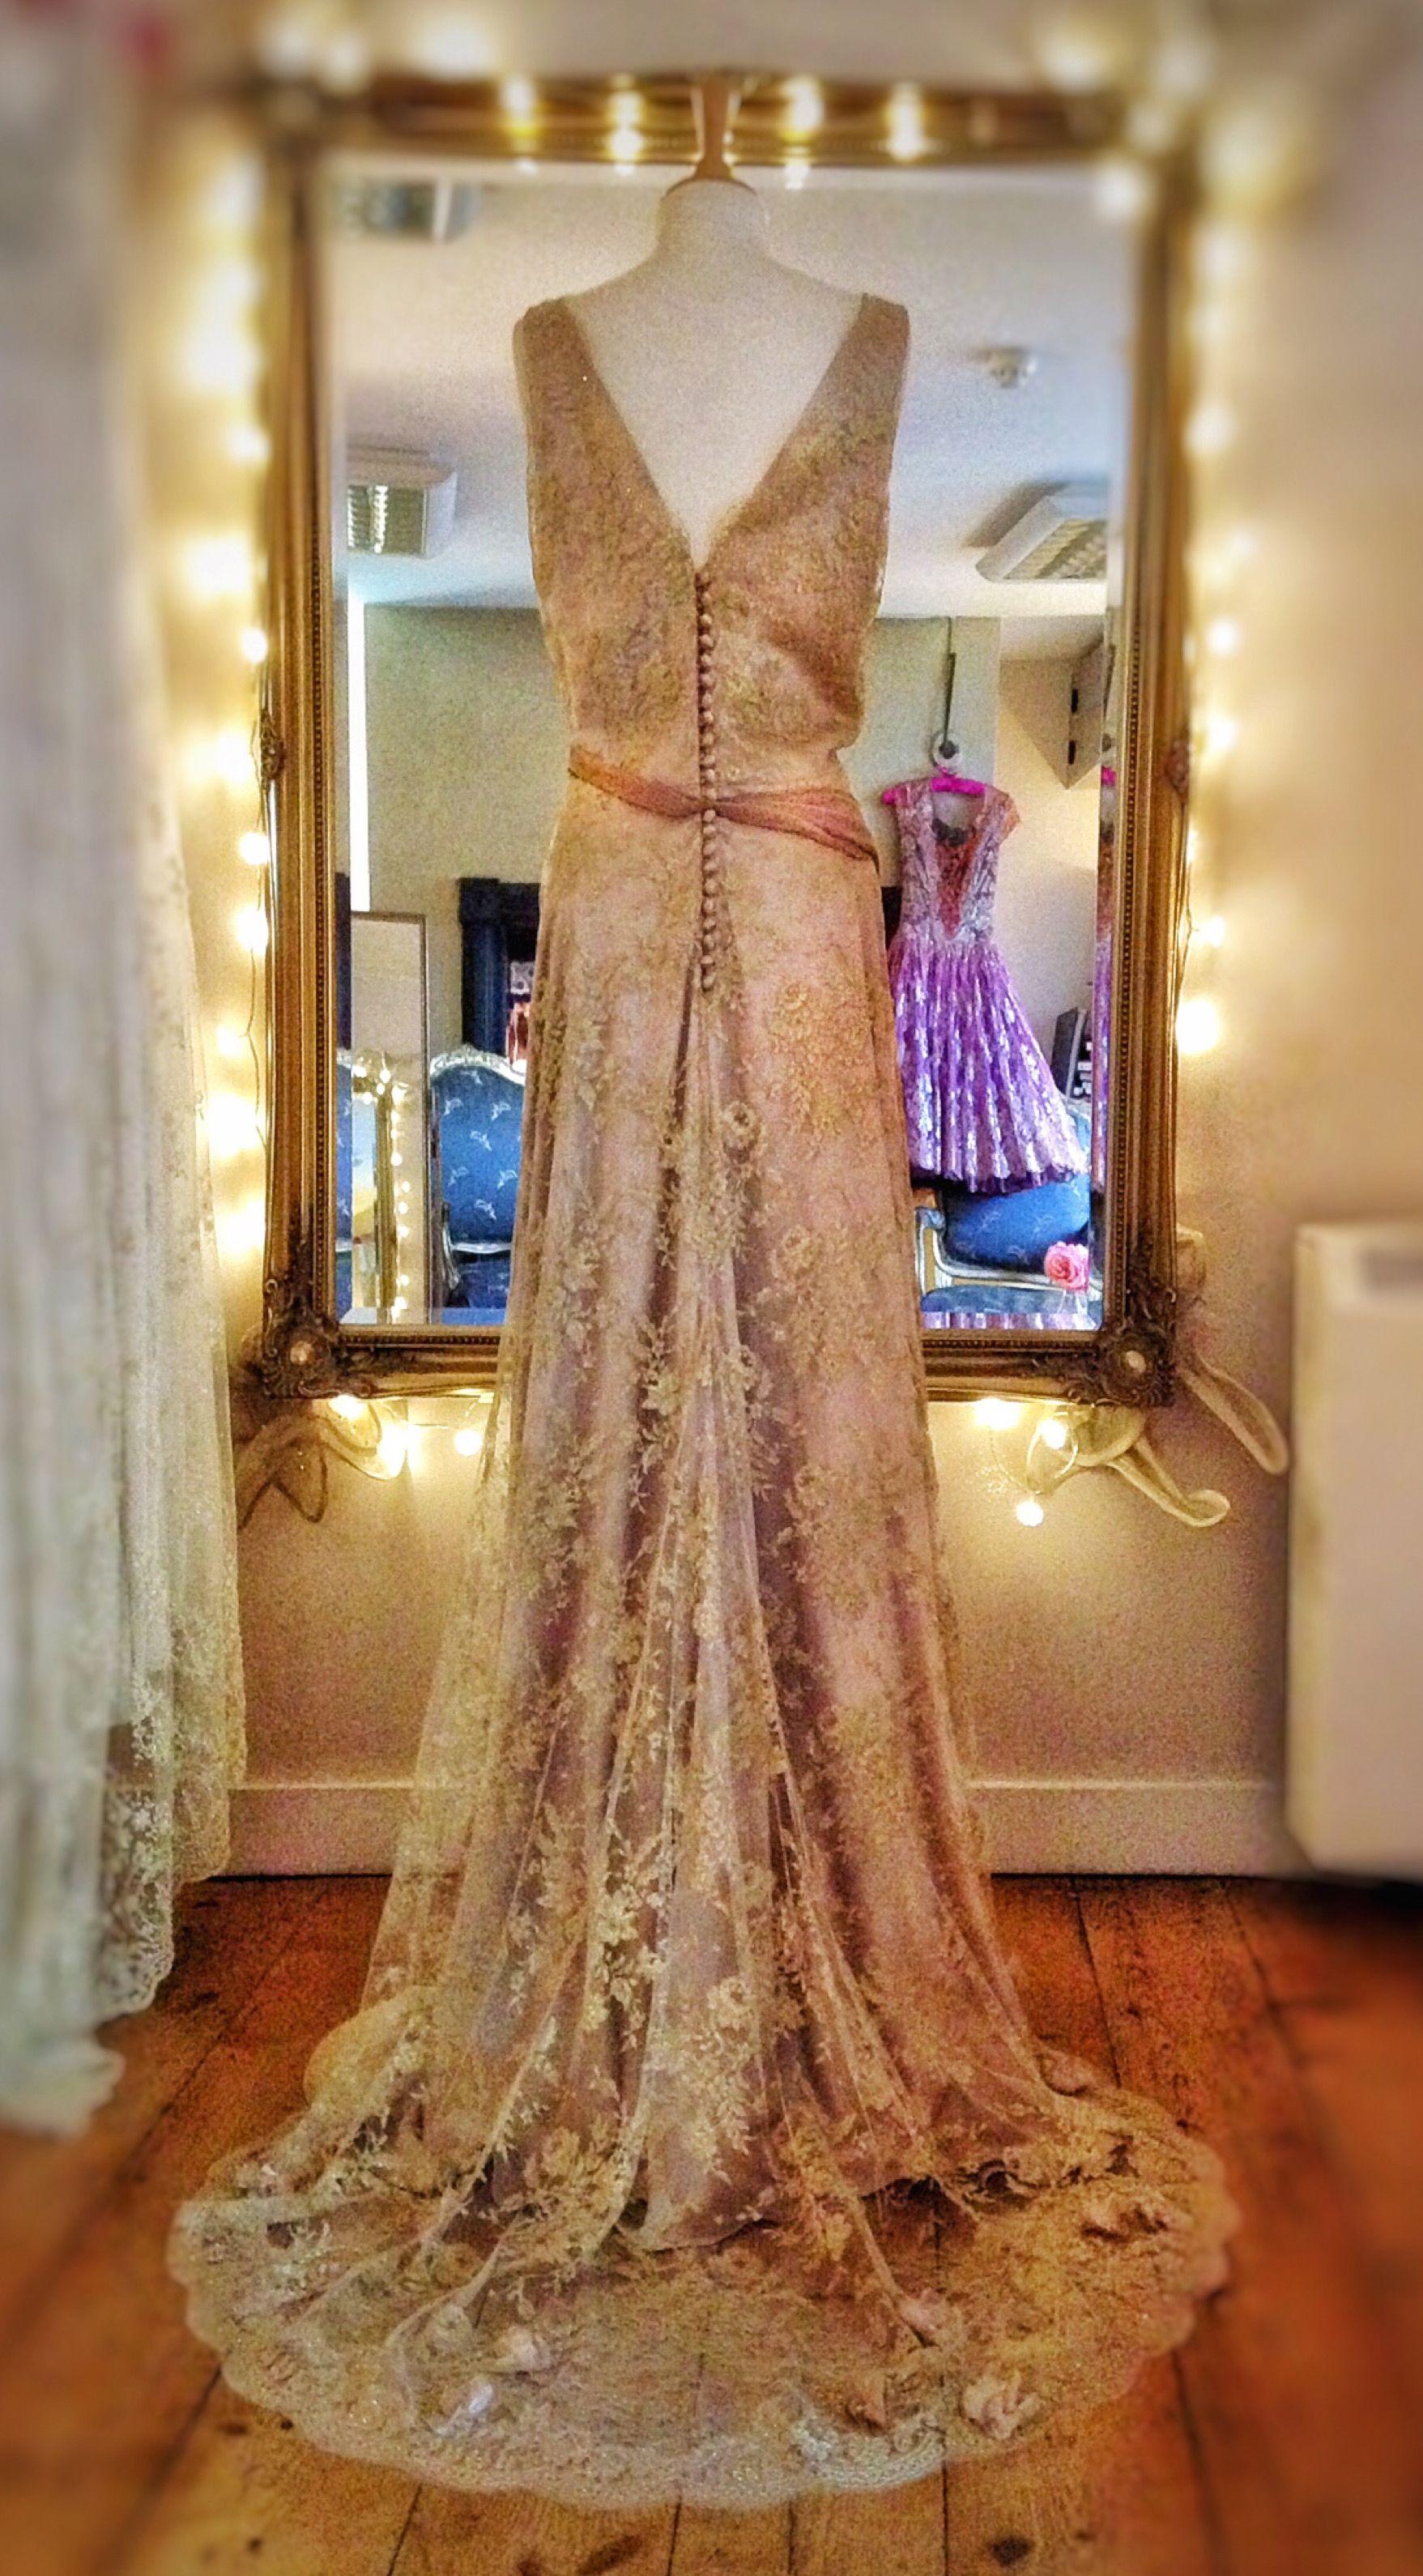 20d3f9aca3e Metallic gold lace over mocha silk satin wedding dress by Joanne Fleming  Design